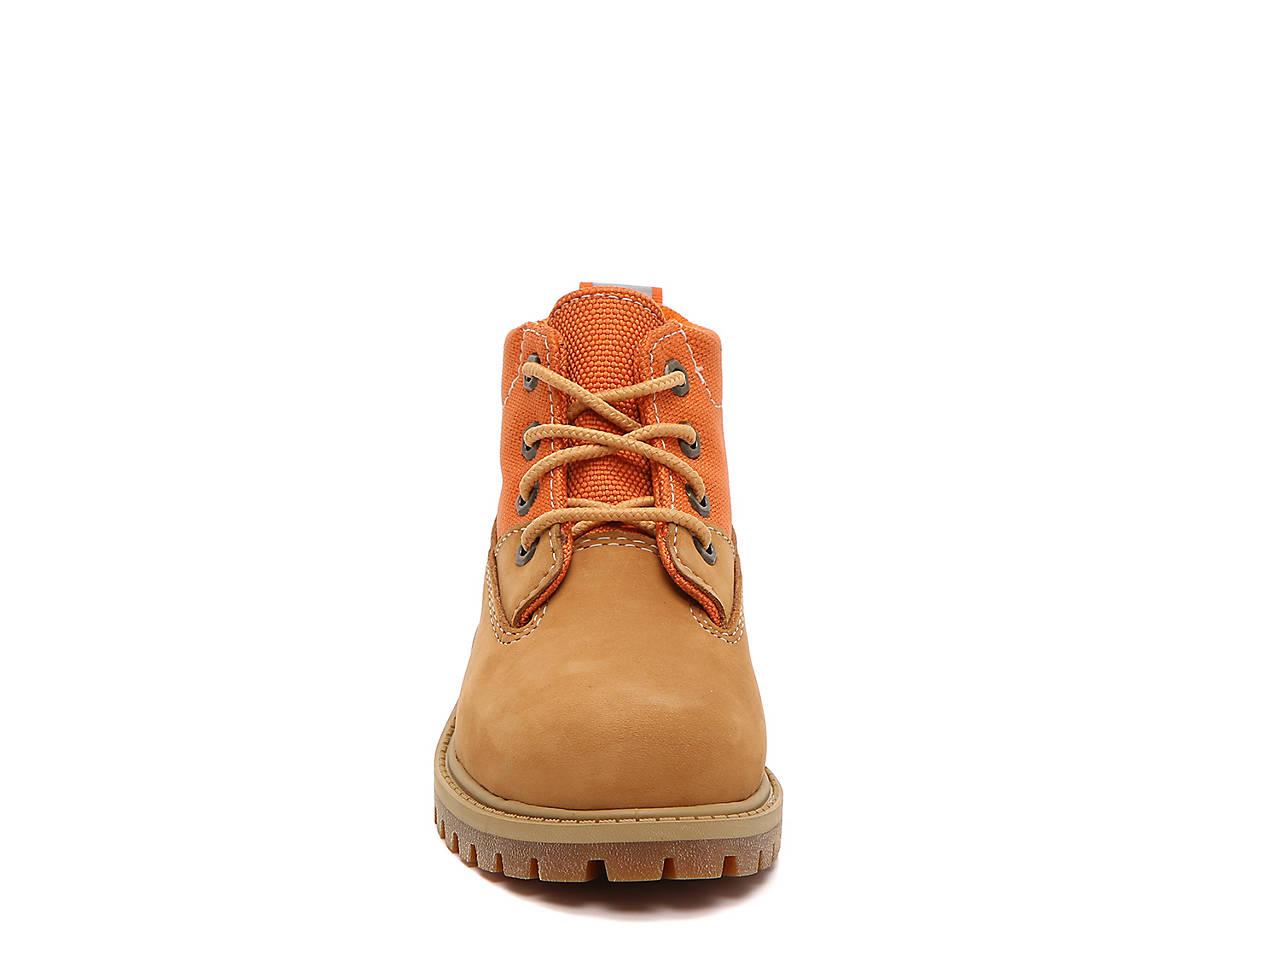 Timberland 6 Inch Treadlight Boot Kids' Kids Shoes DSW  DSW